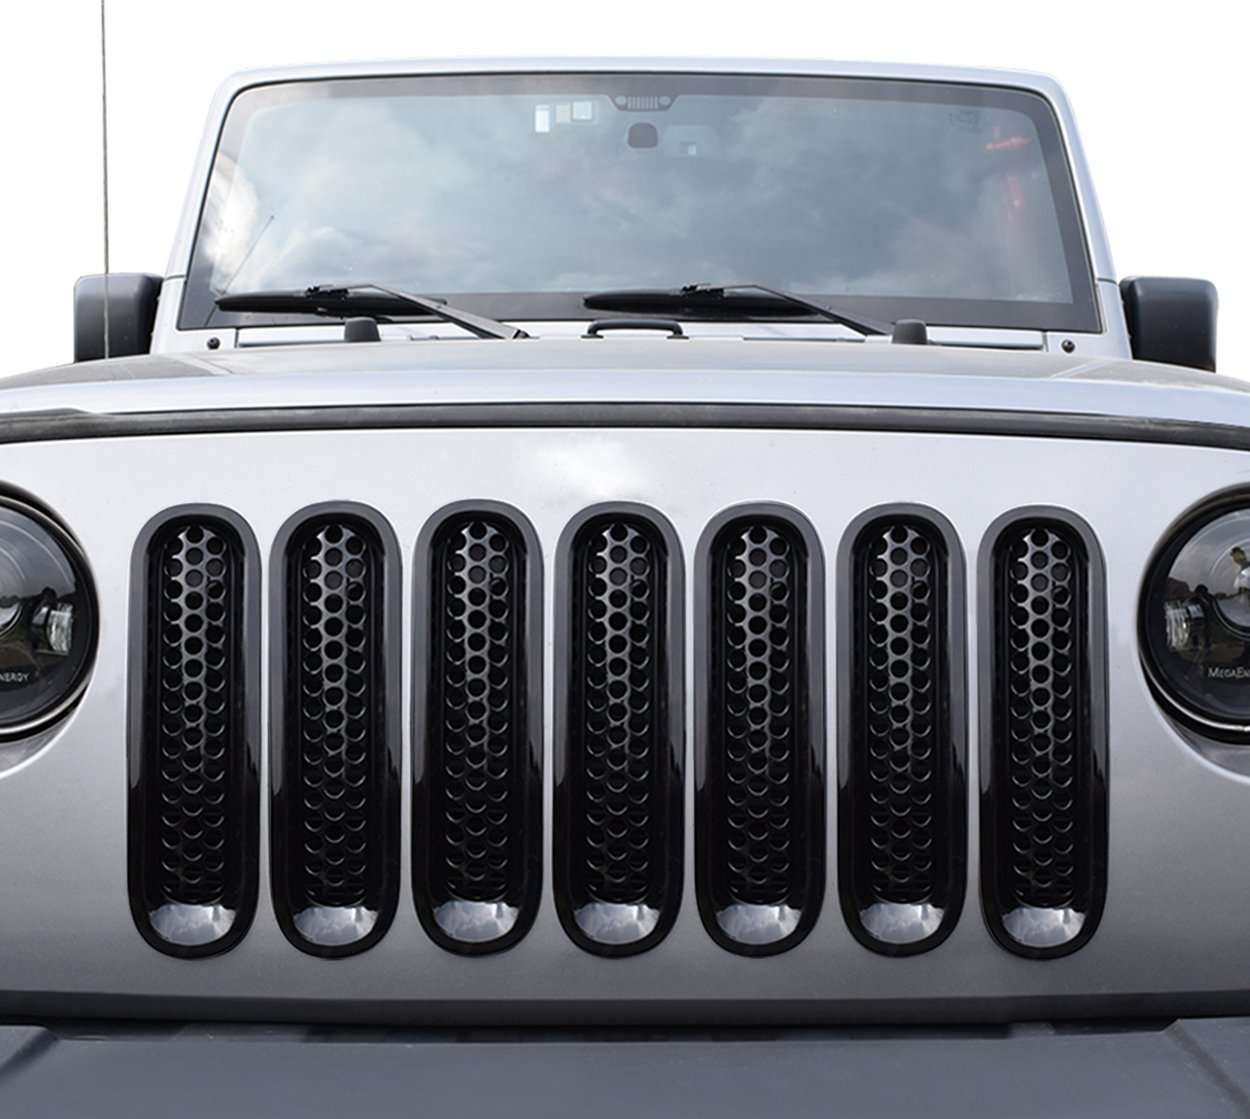 Jeep Wrangler Accessories Jeep Wrangler Accessories Jeep